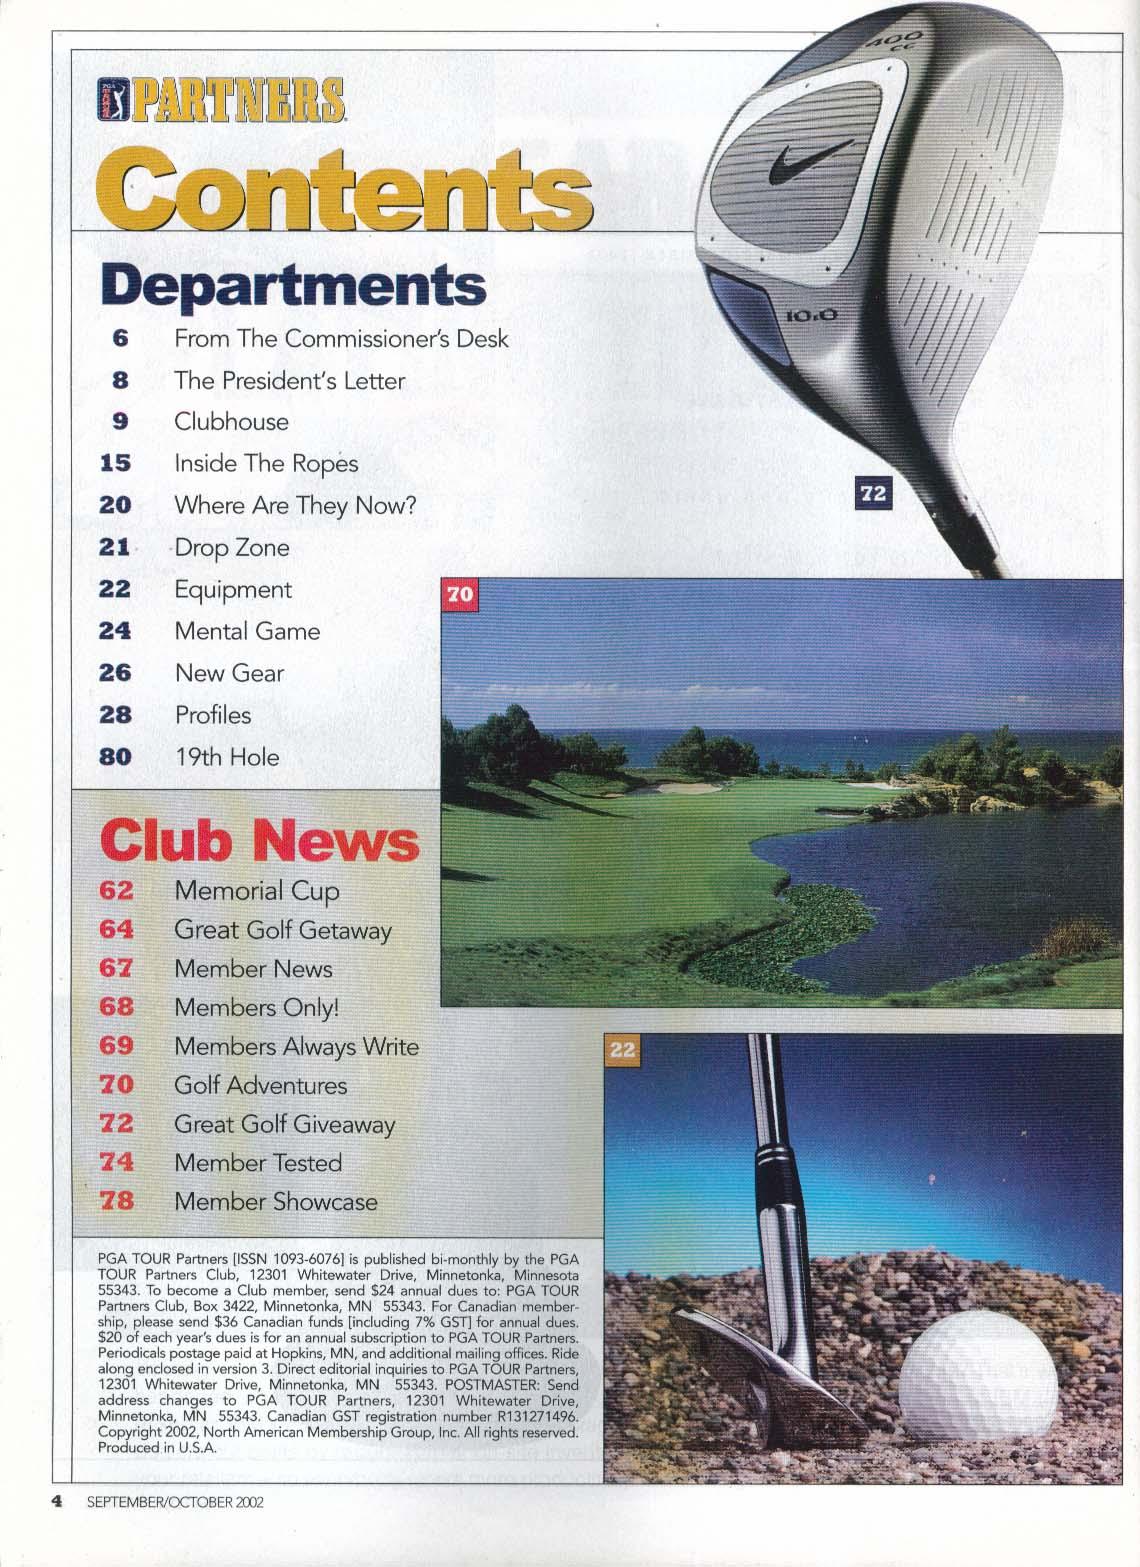 PGA TOUR PARTNERS Charles Howell III Ryder Cup Doug Tewell 9-10 2002